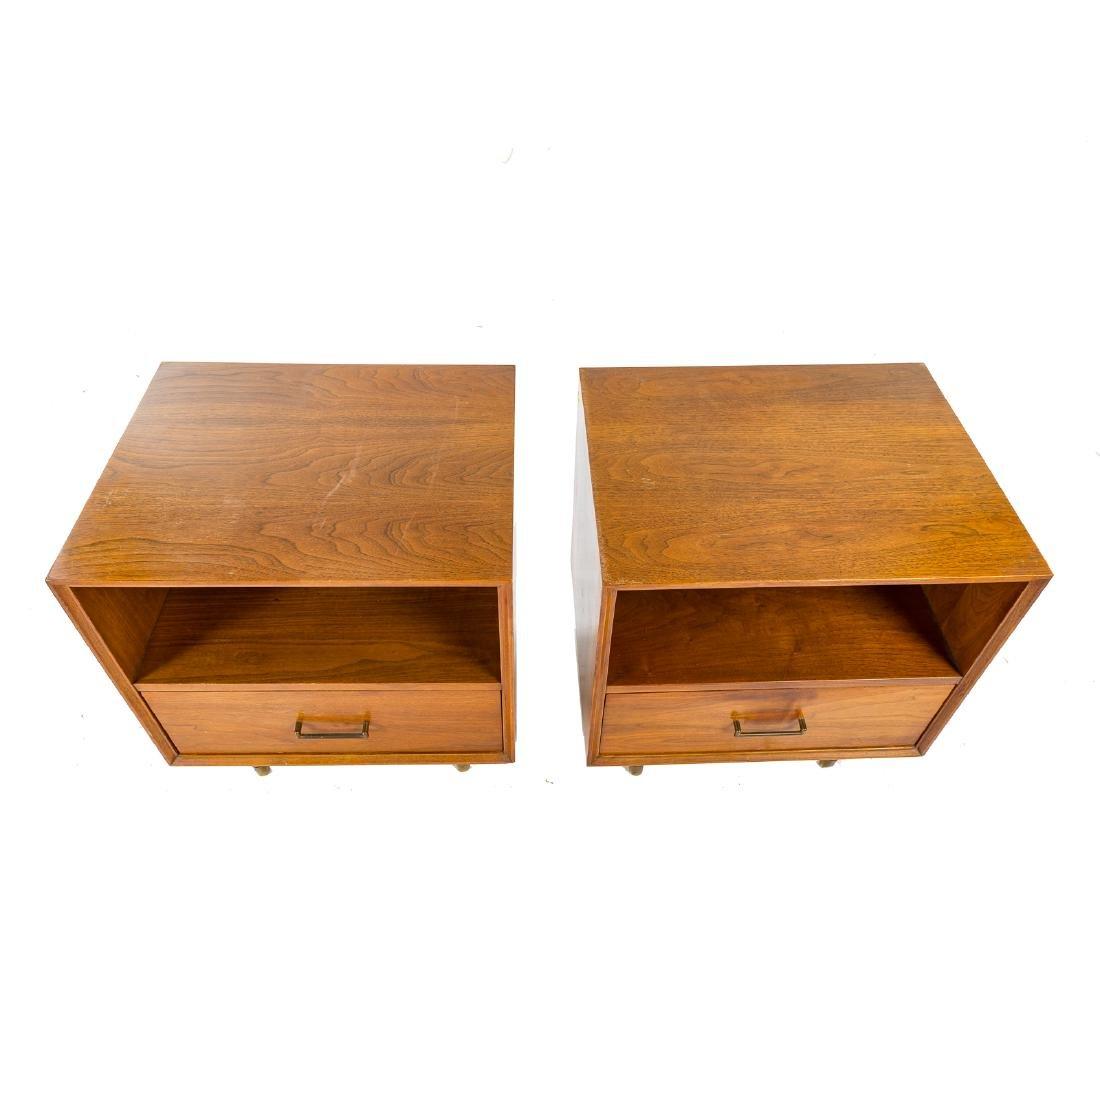 Pair of Furnette Walnut Nightstands - 4